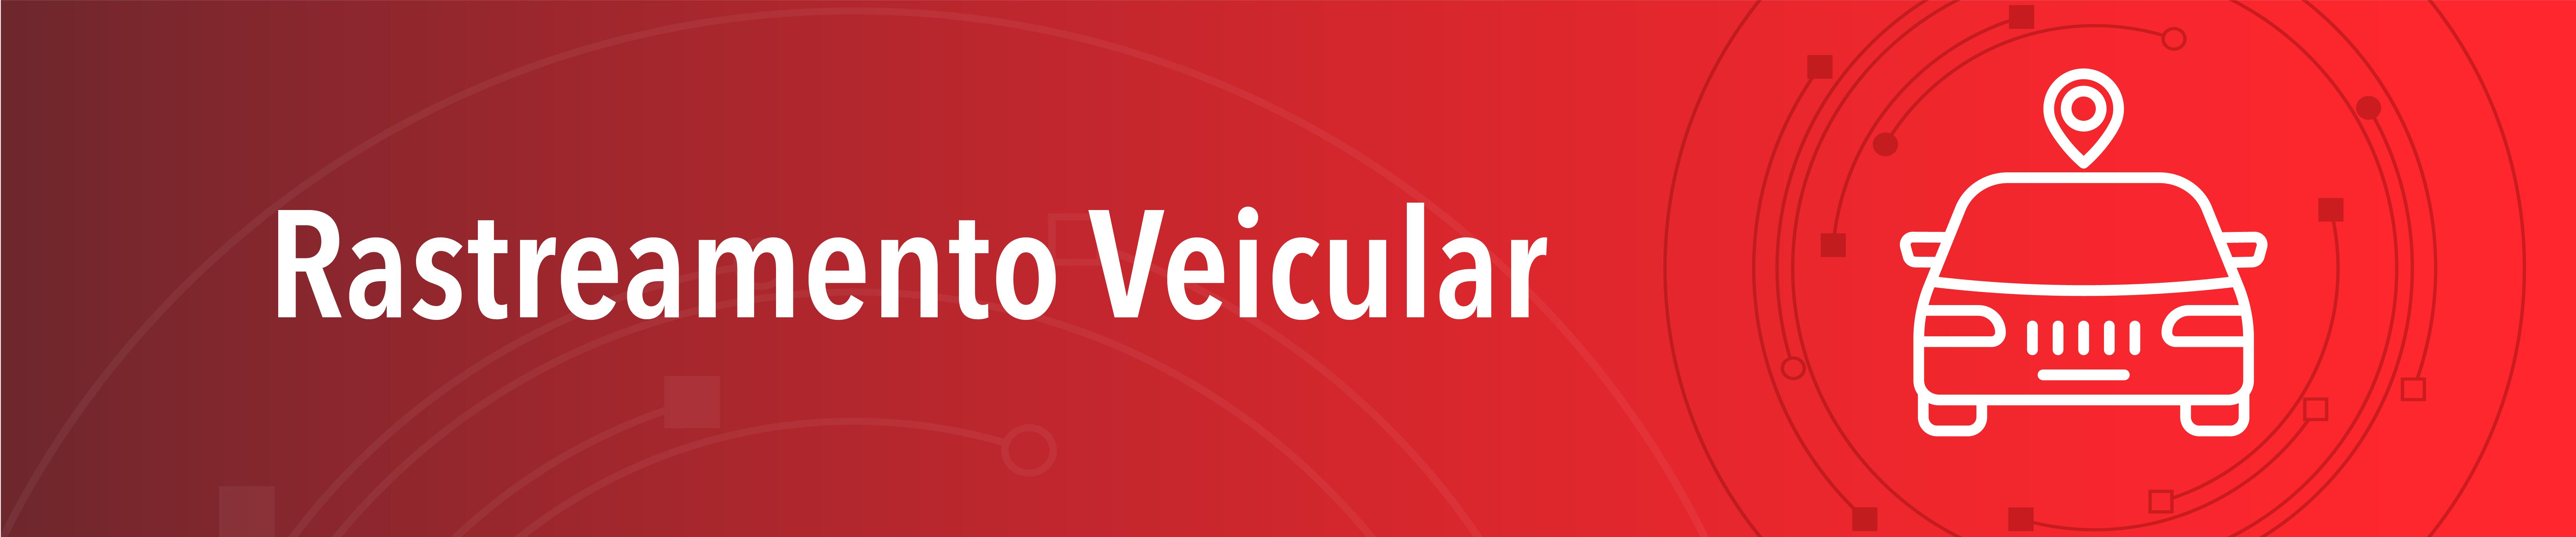 Banner Site Protector_SERVIÇOS_Rastreamento veicular